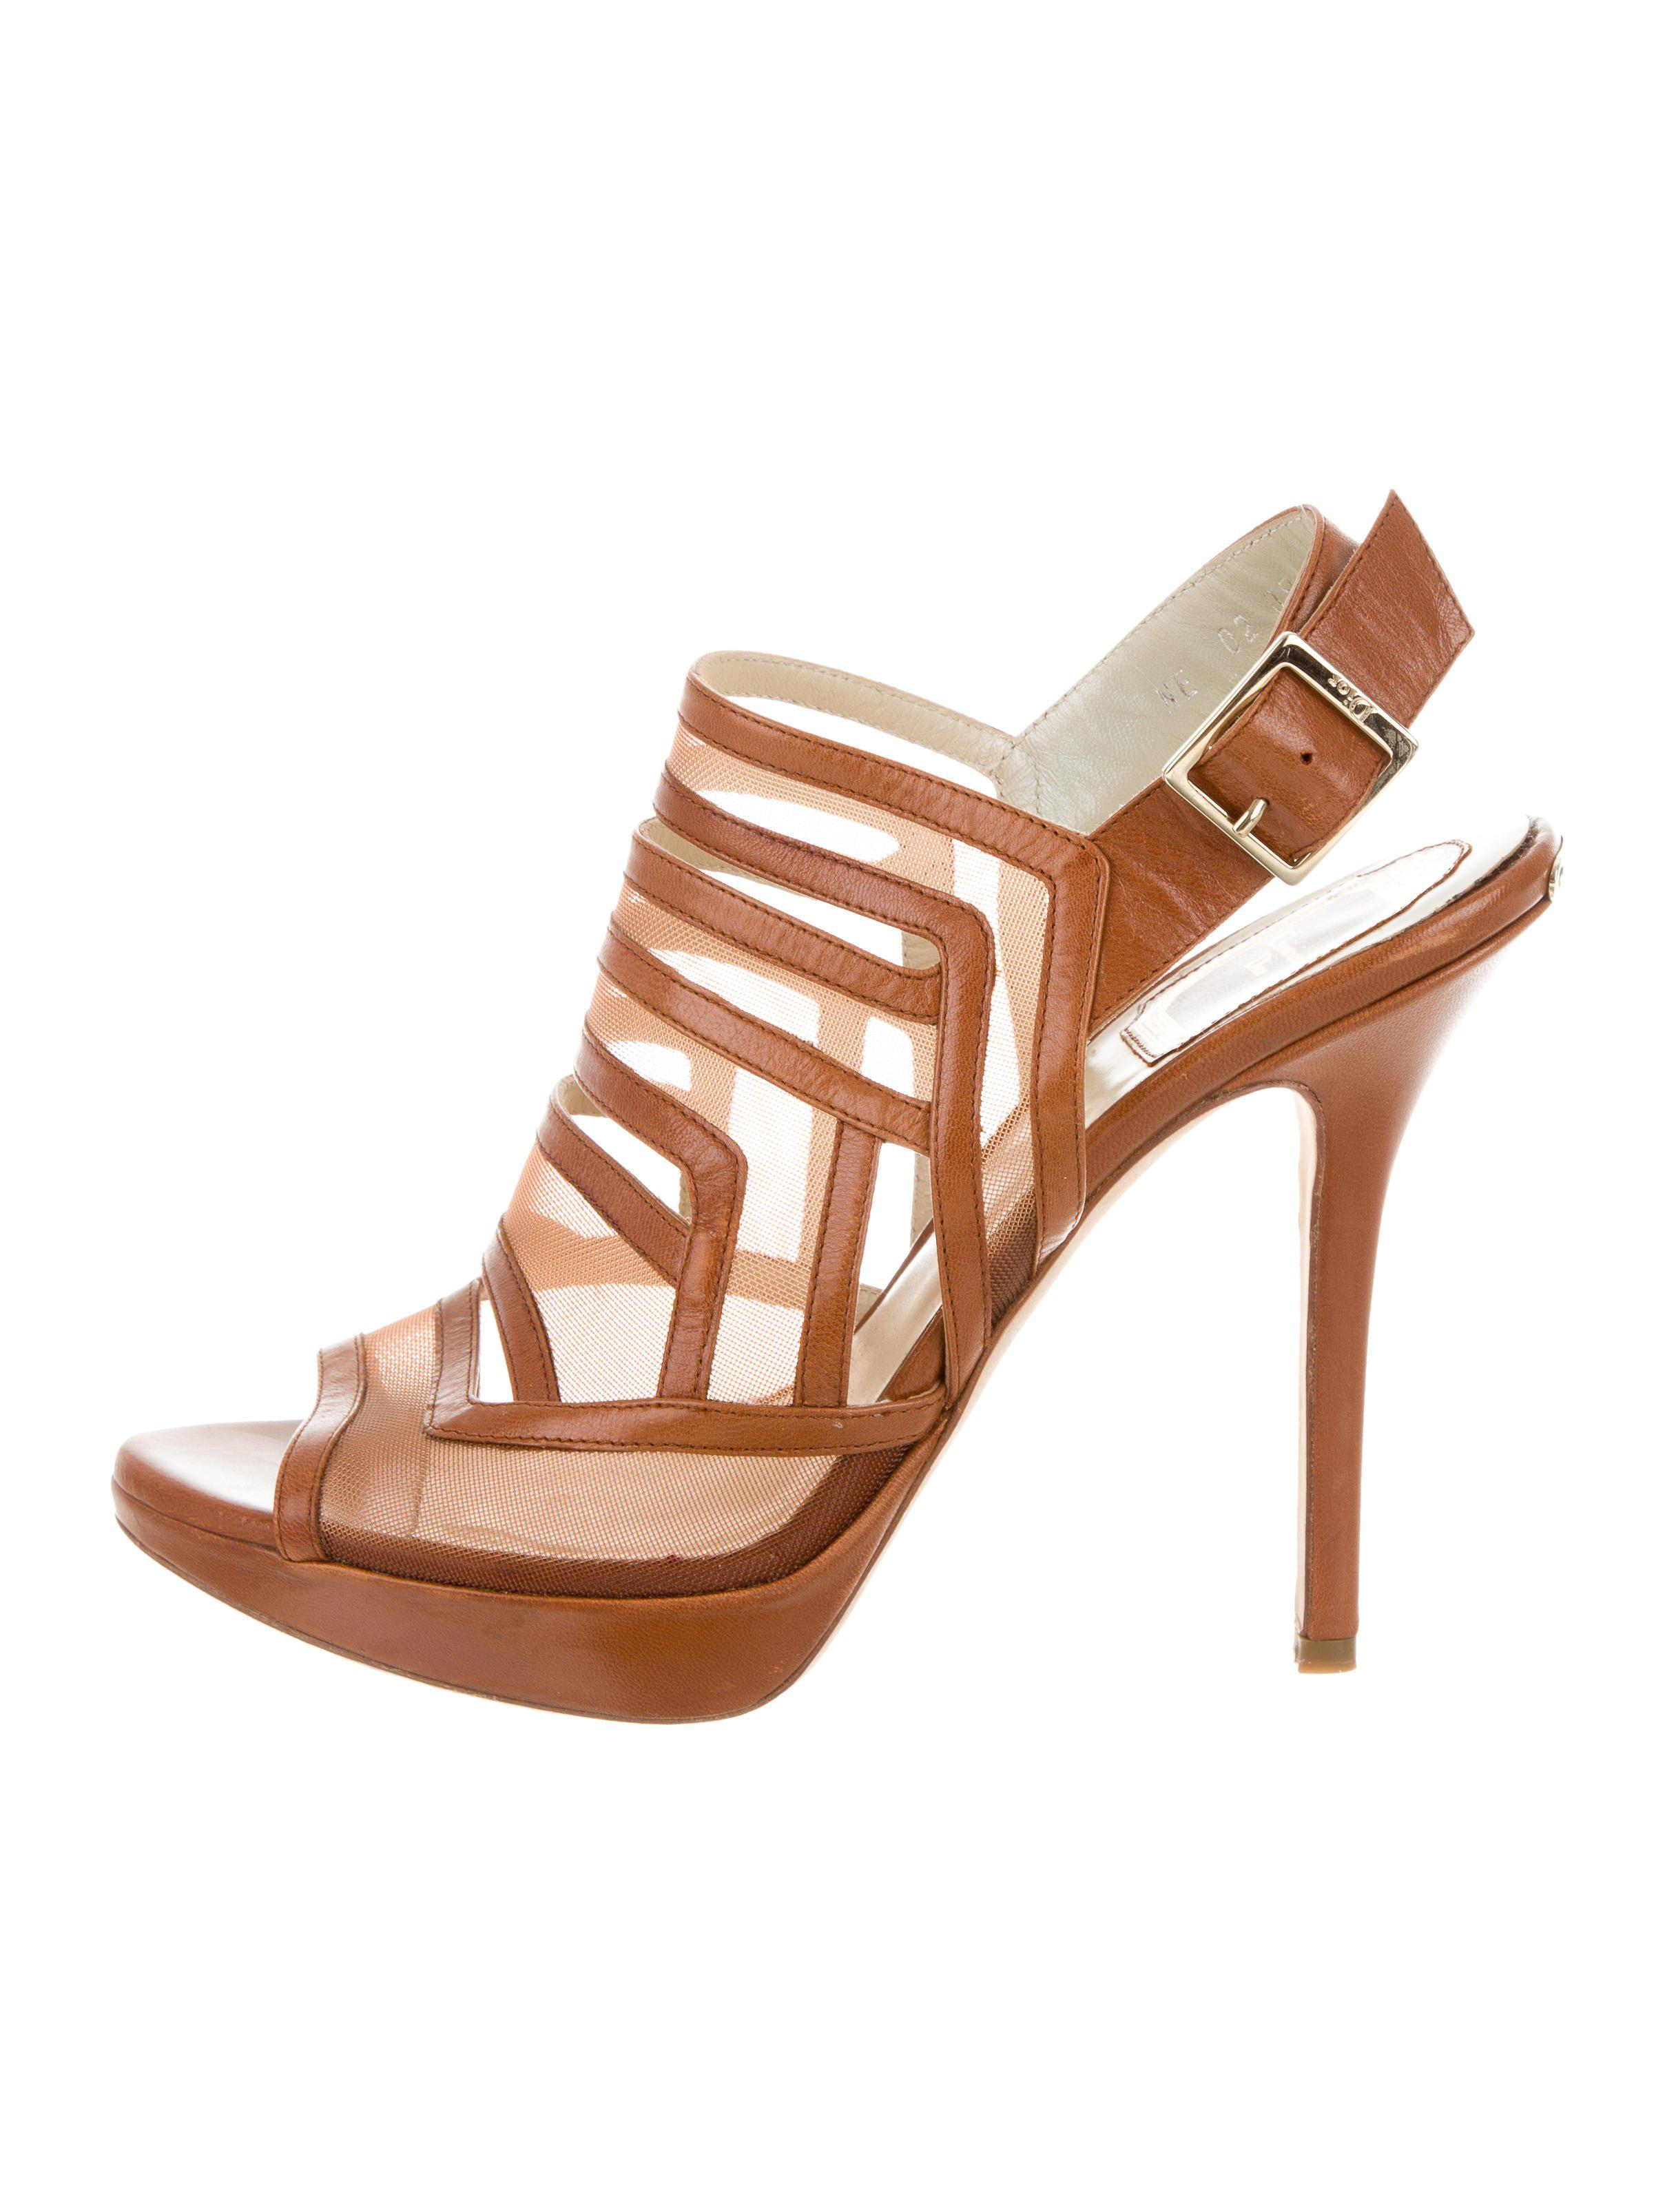 b3e30a89b00 Lyst - Dior Mesh Cage Sandals Gold in Metallic